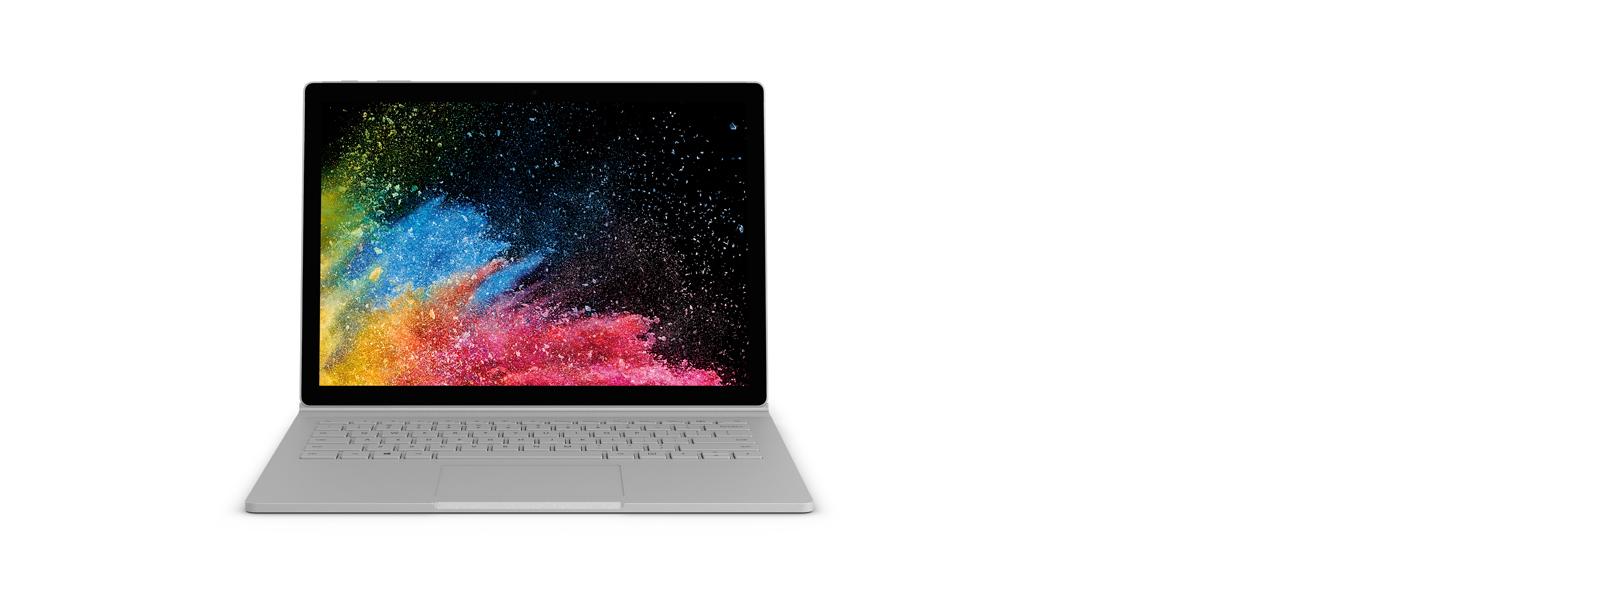 Surface Book 2 in laptopmodus met schermopname.